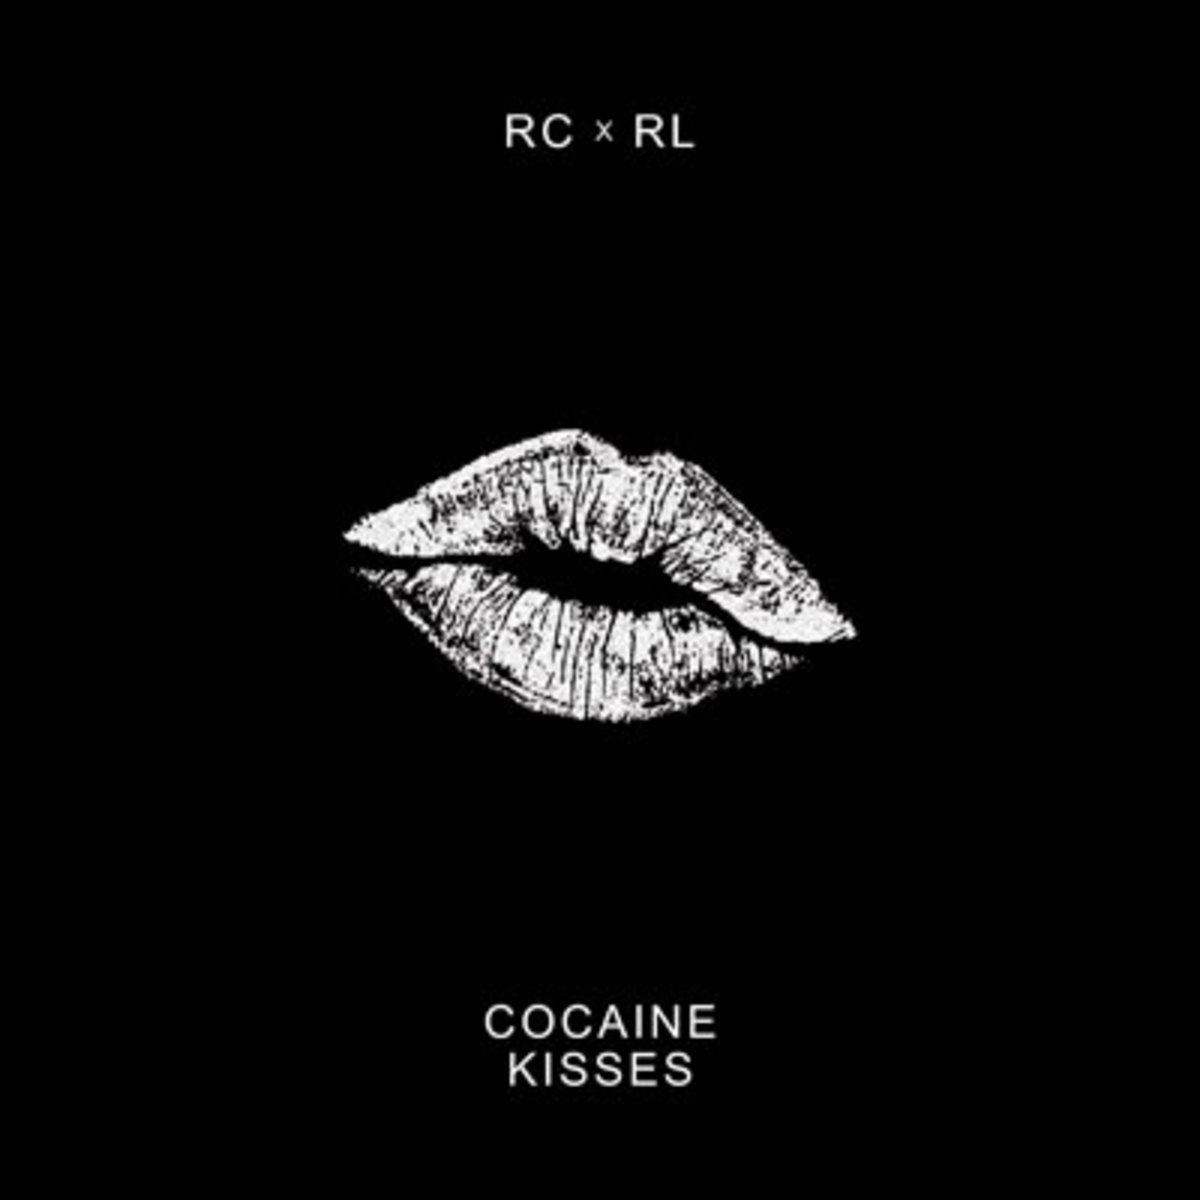 randy-class-cocaine-kisses-remix.jpg